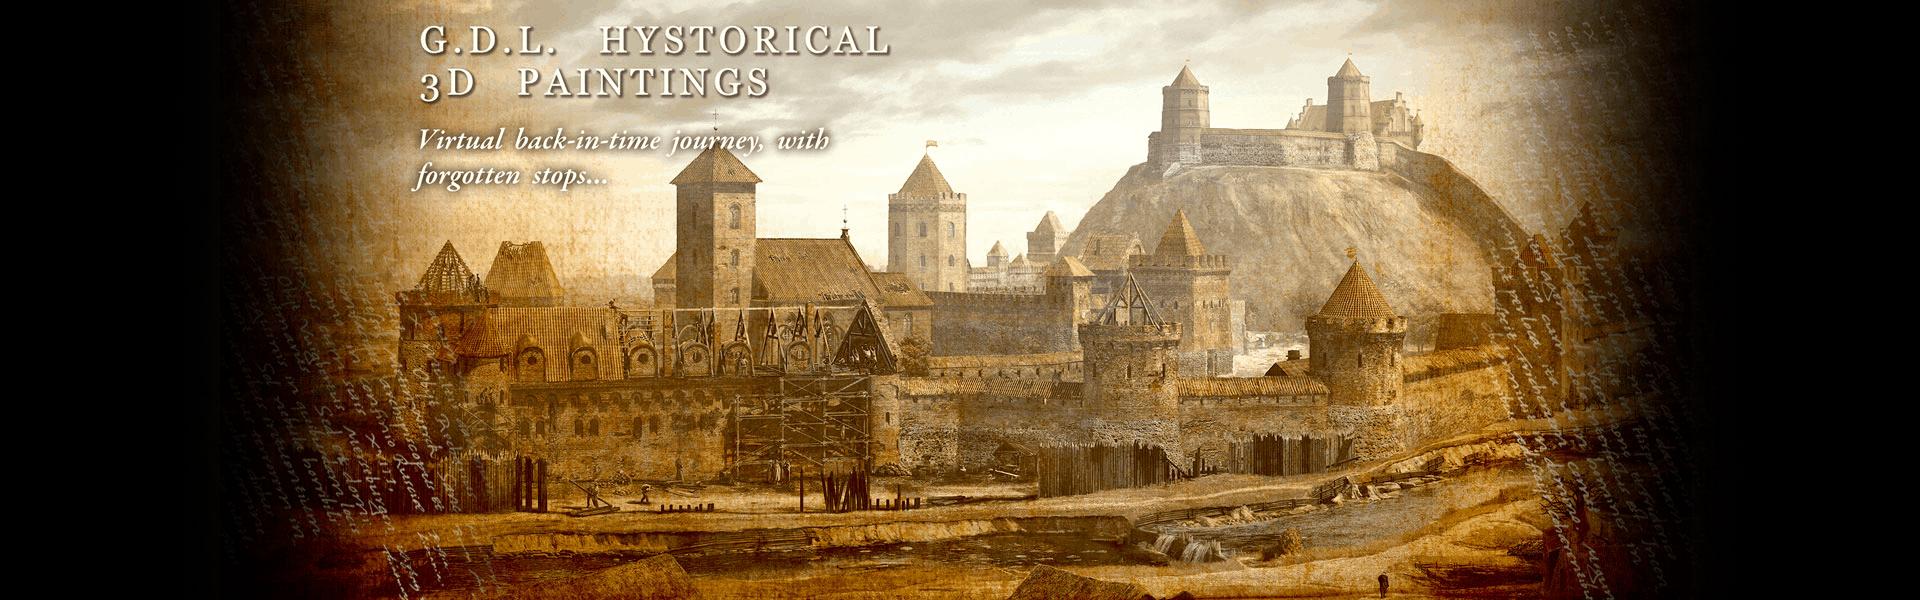 LDF historical paintings